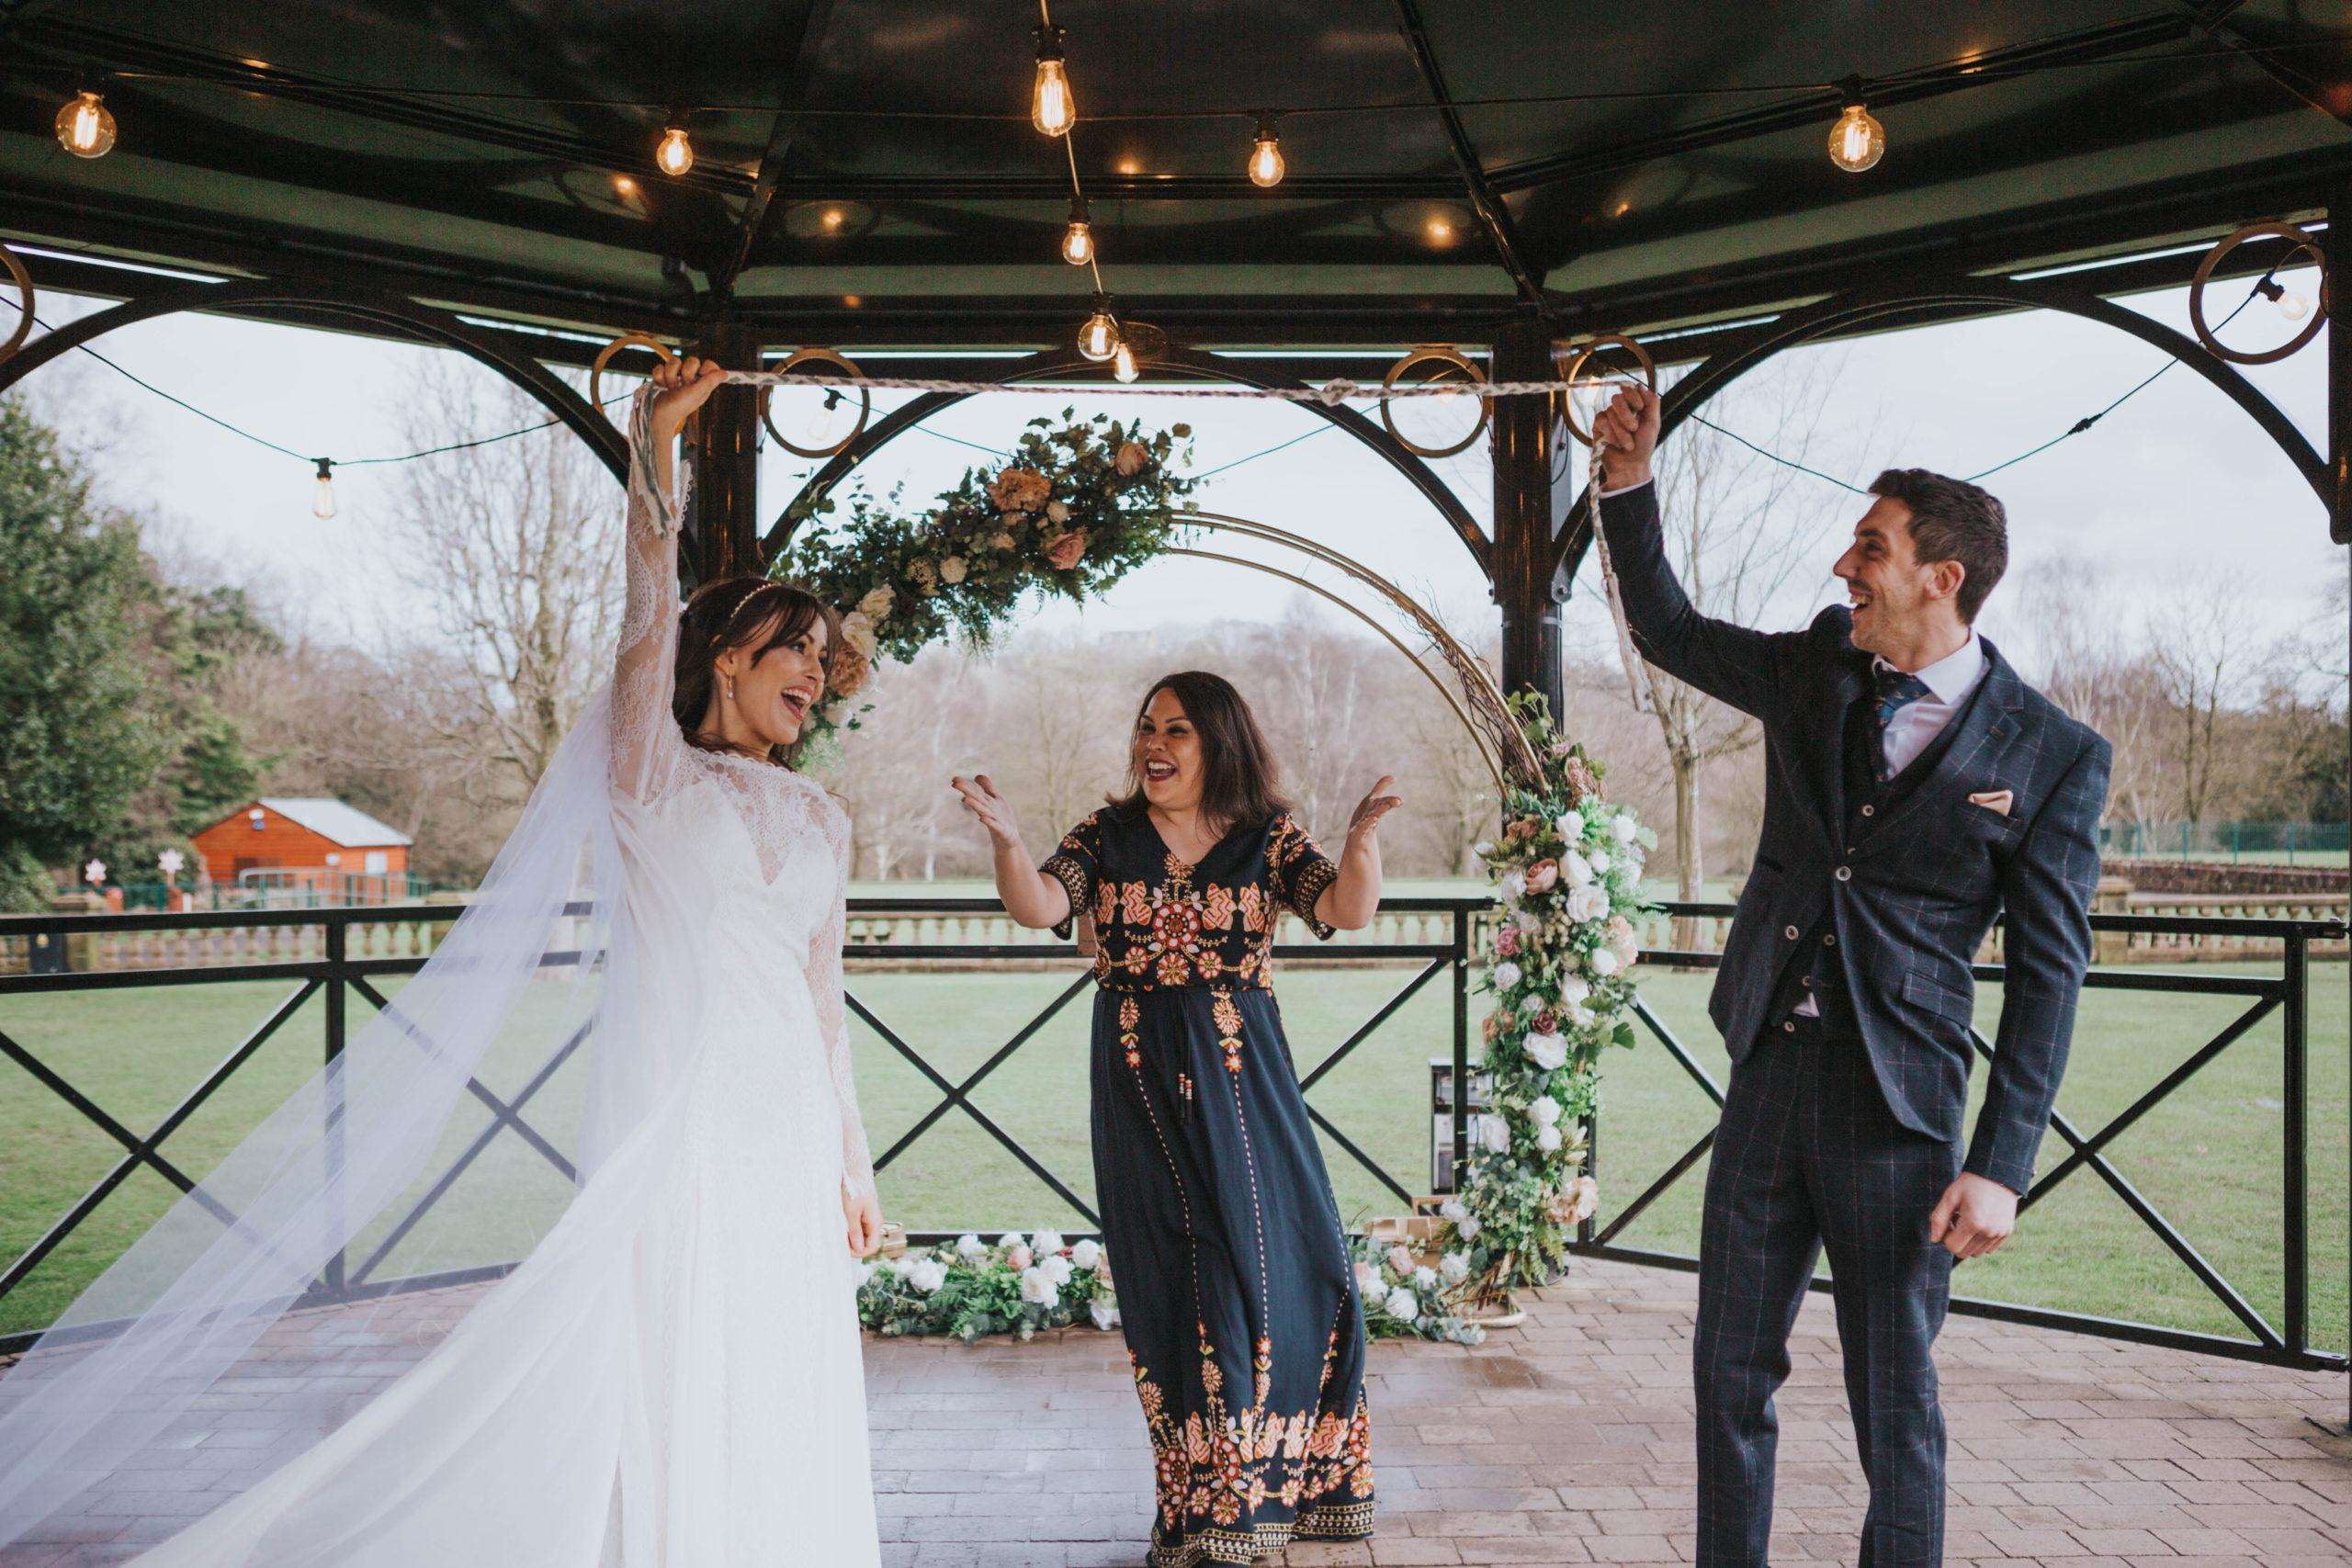 Independent wedding celebrant with bride & groom